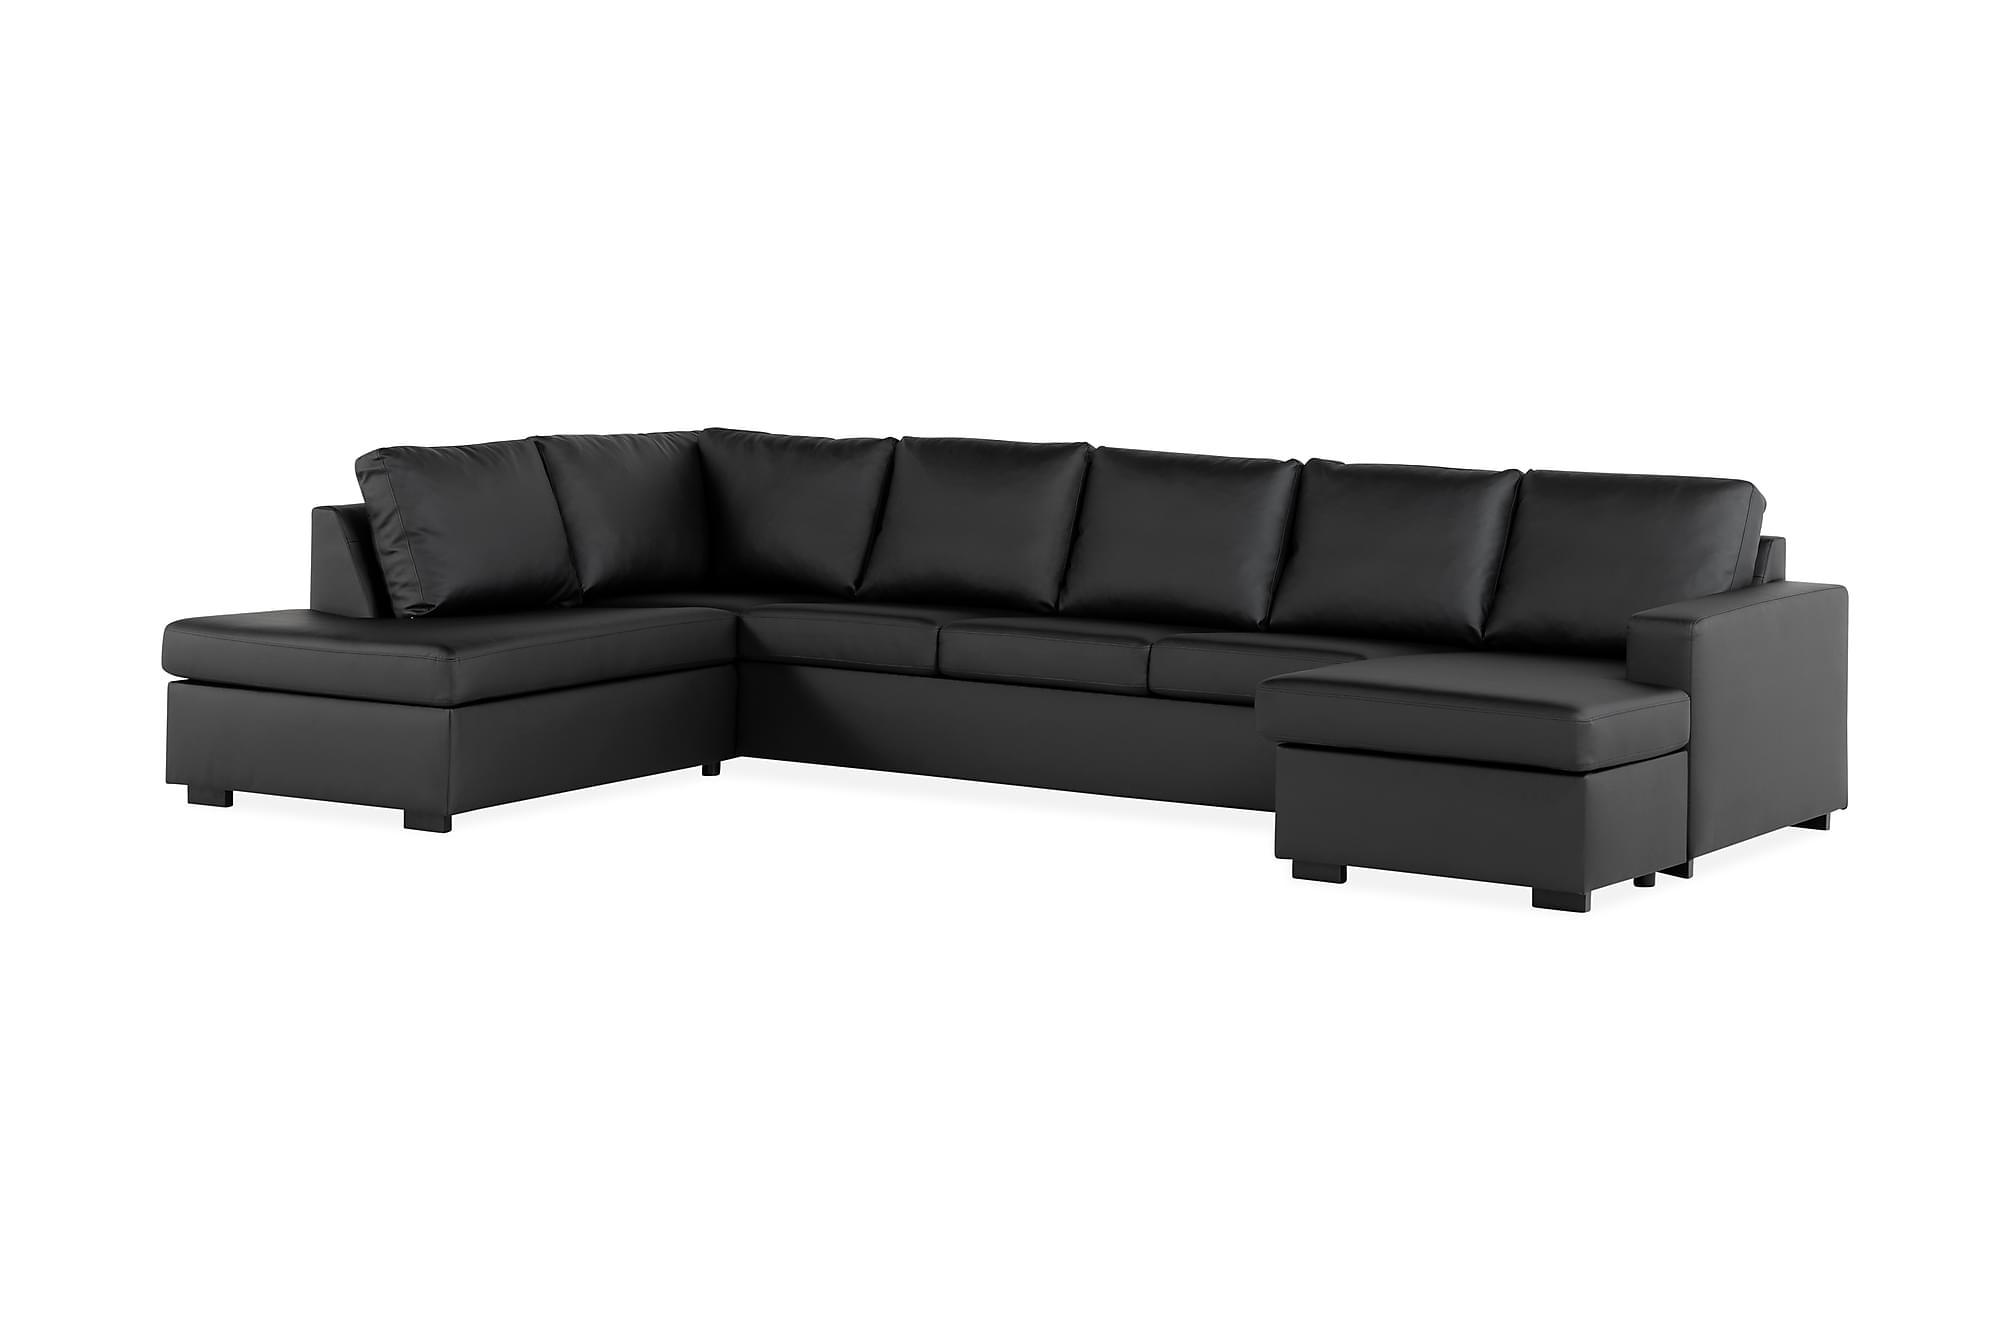 crazy u sofa xxl venstre svart pu. Black Bedroom Furniture Sets. Home Design Ideas